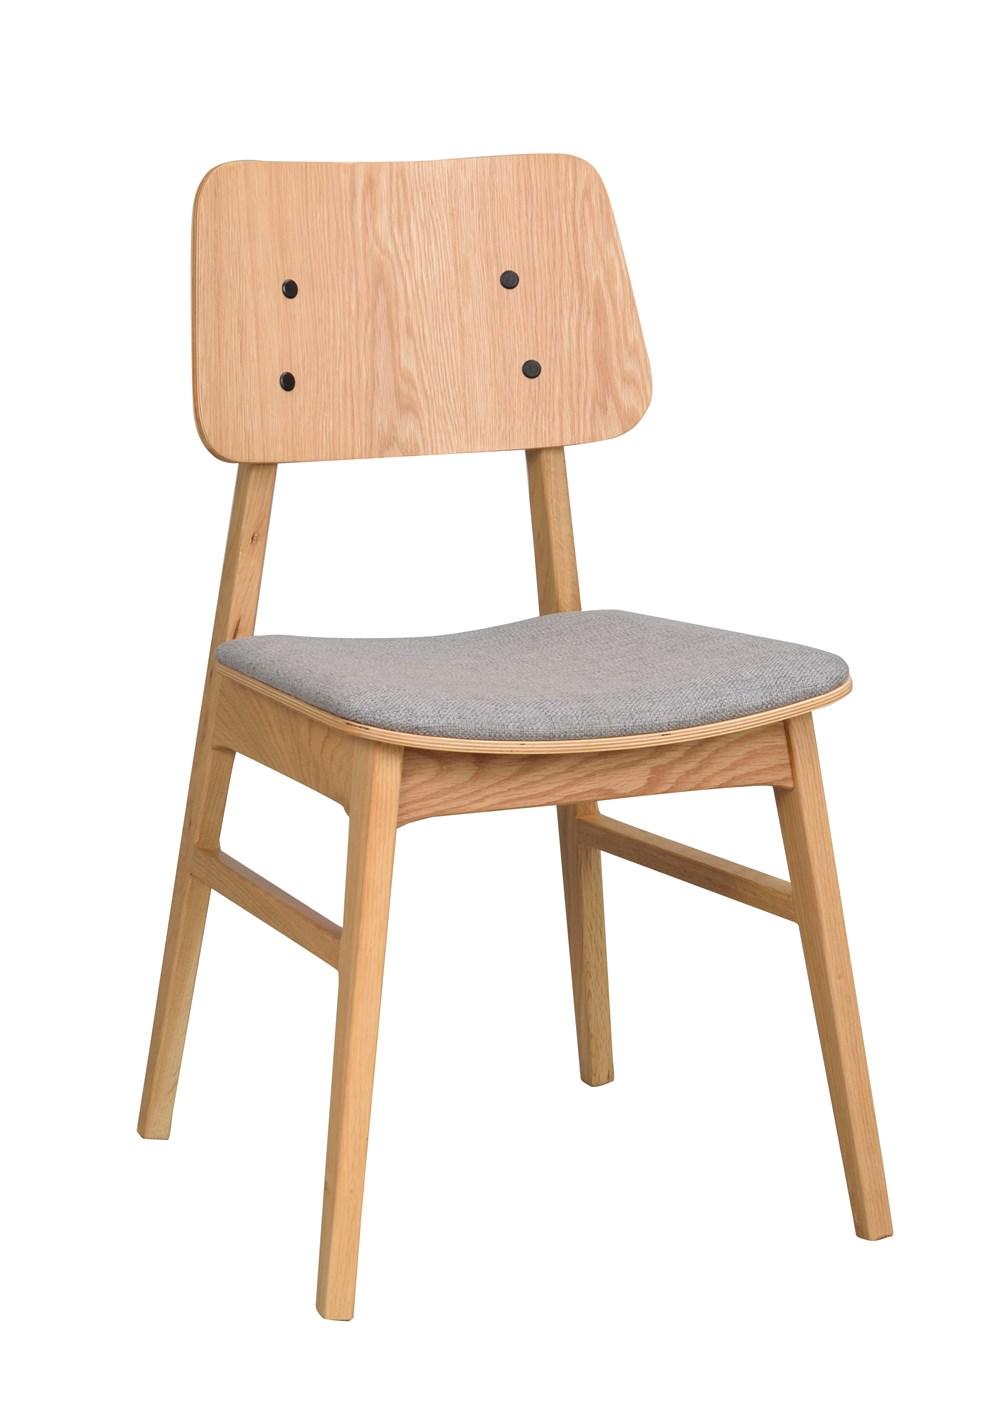 Nagano tuoli tammi/vaaleanharmaa, Rowico